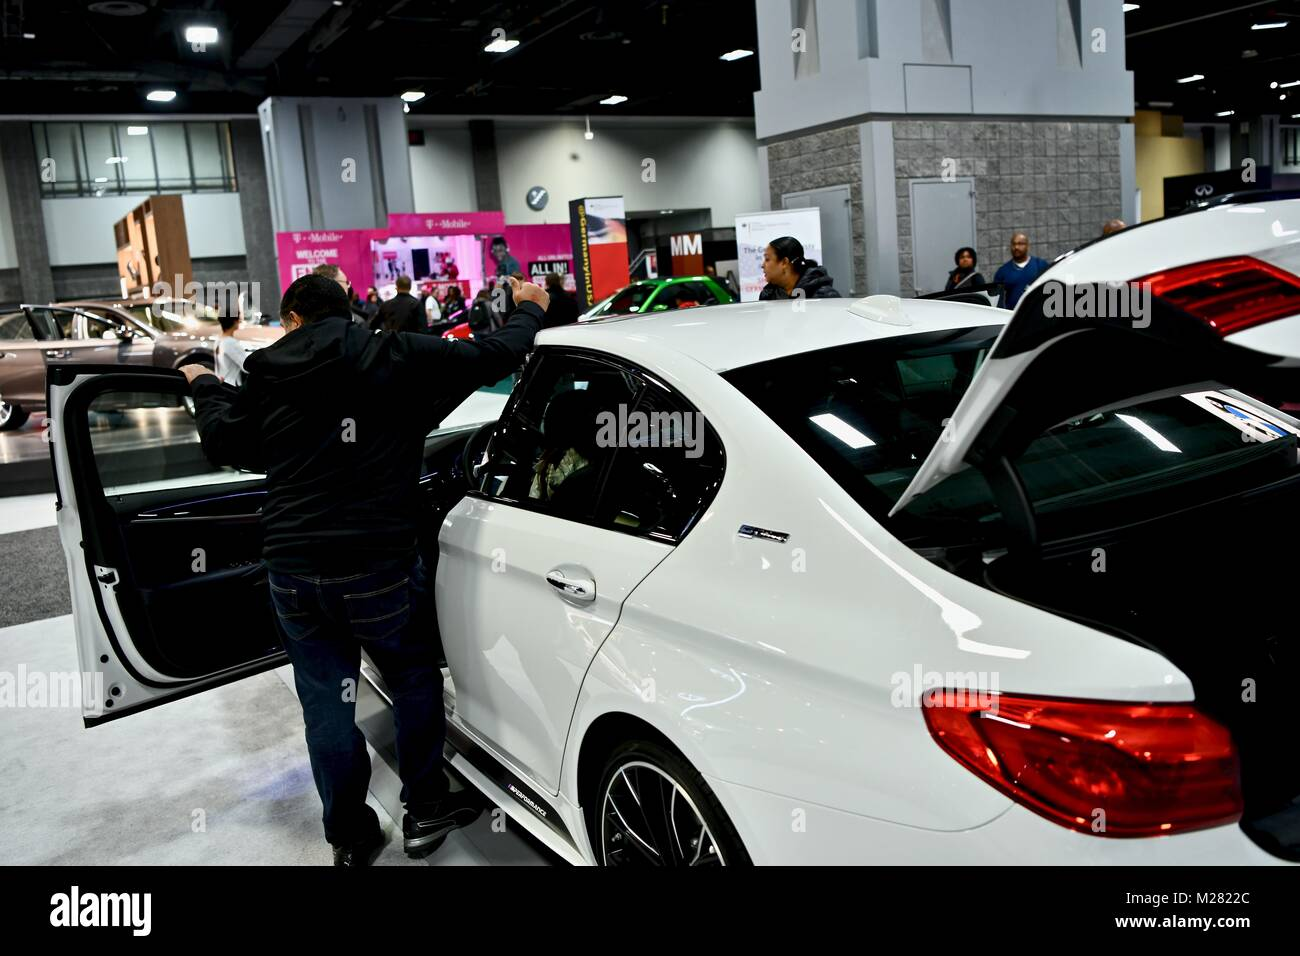 Lexus Car Displayed At The Washington Auto Show Washington DC - Washington car show discount tickets